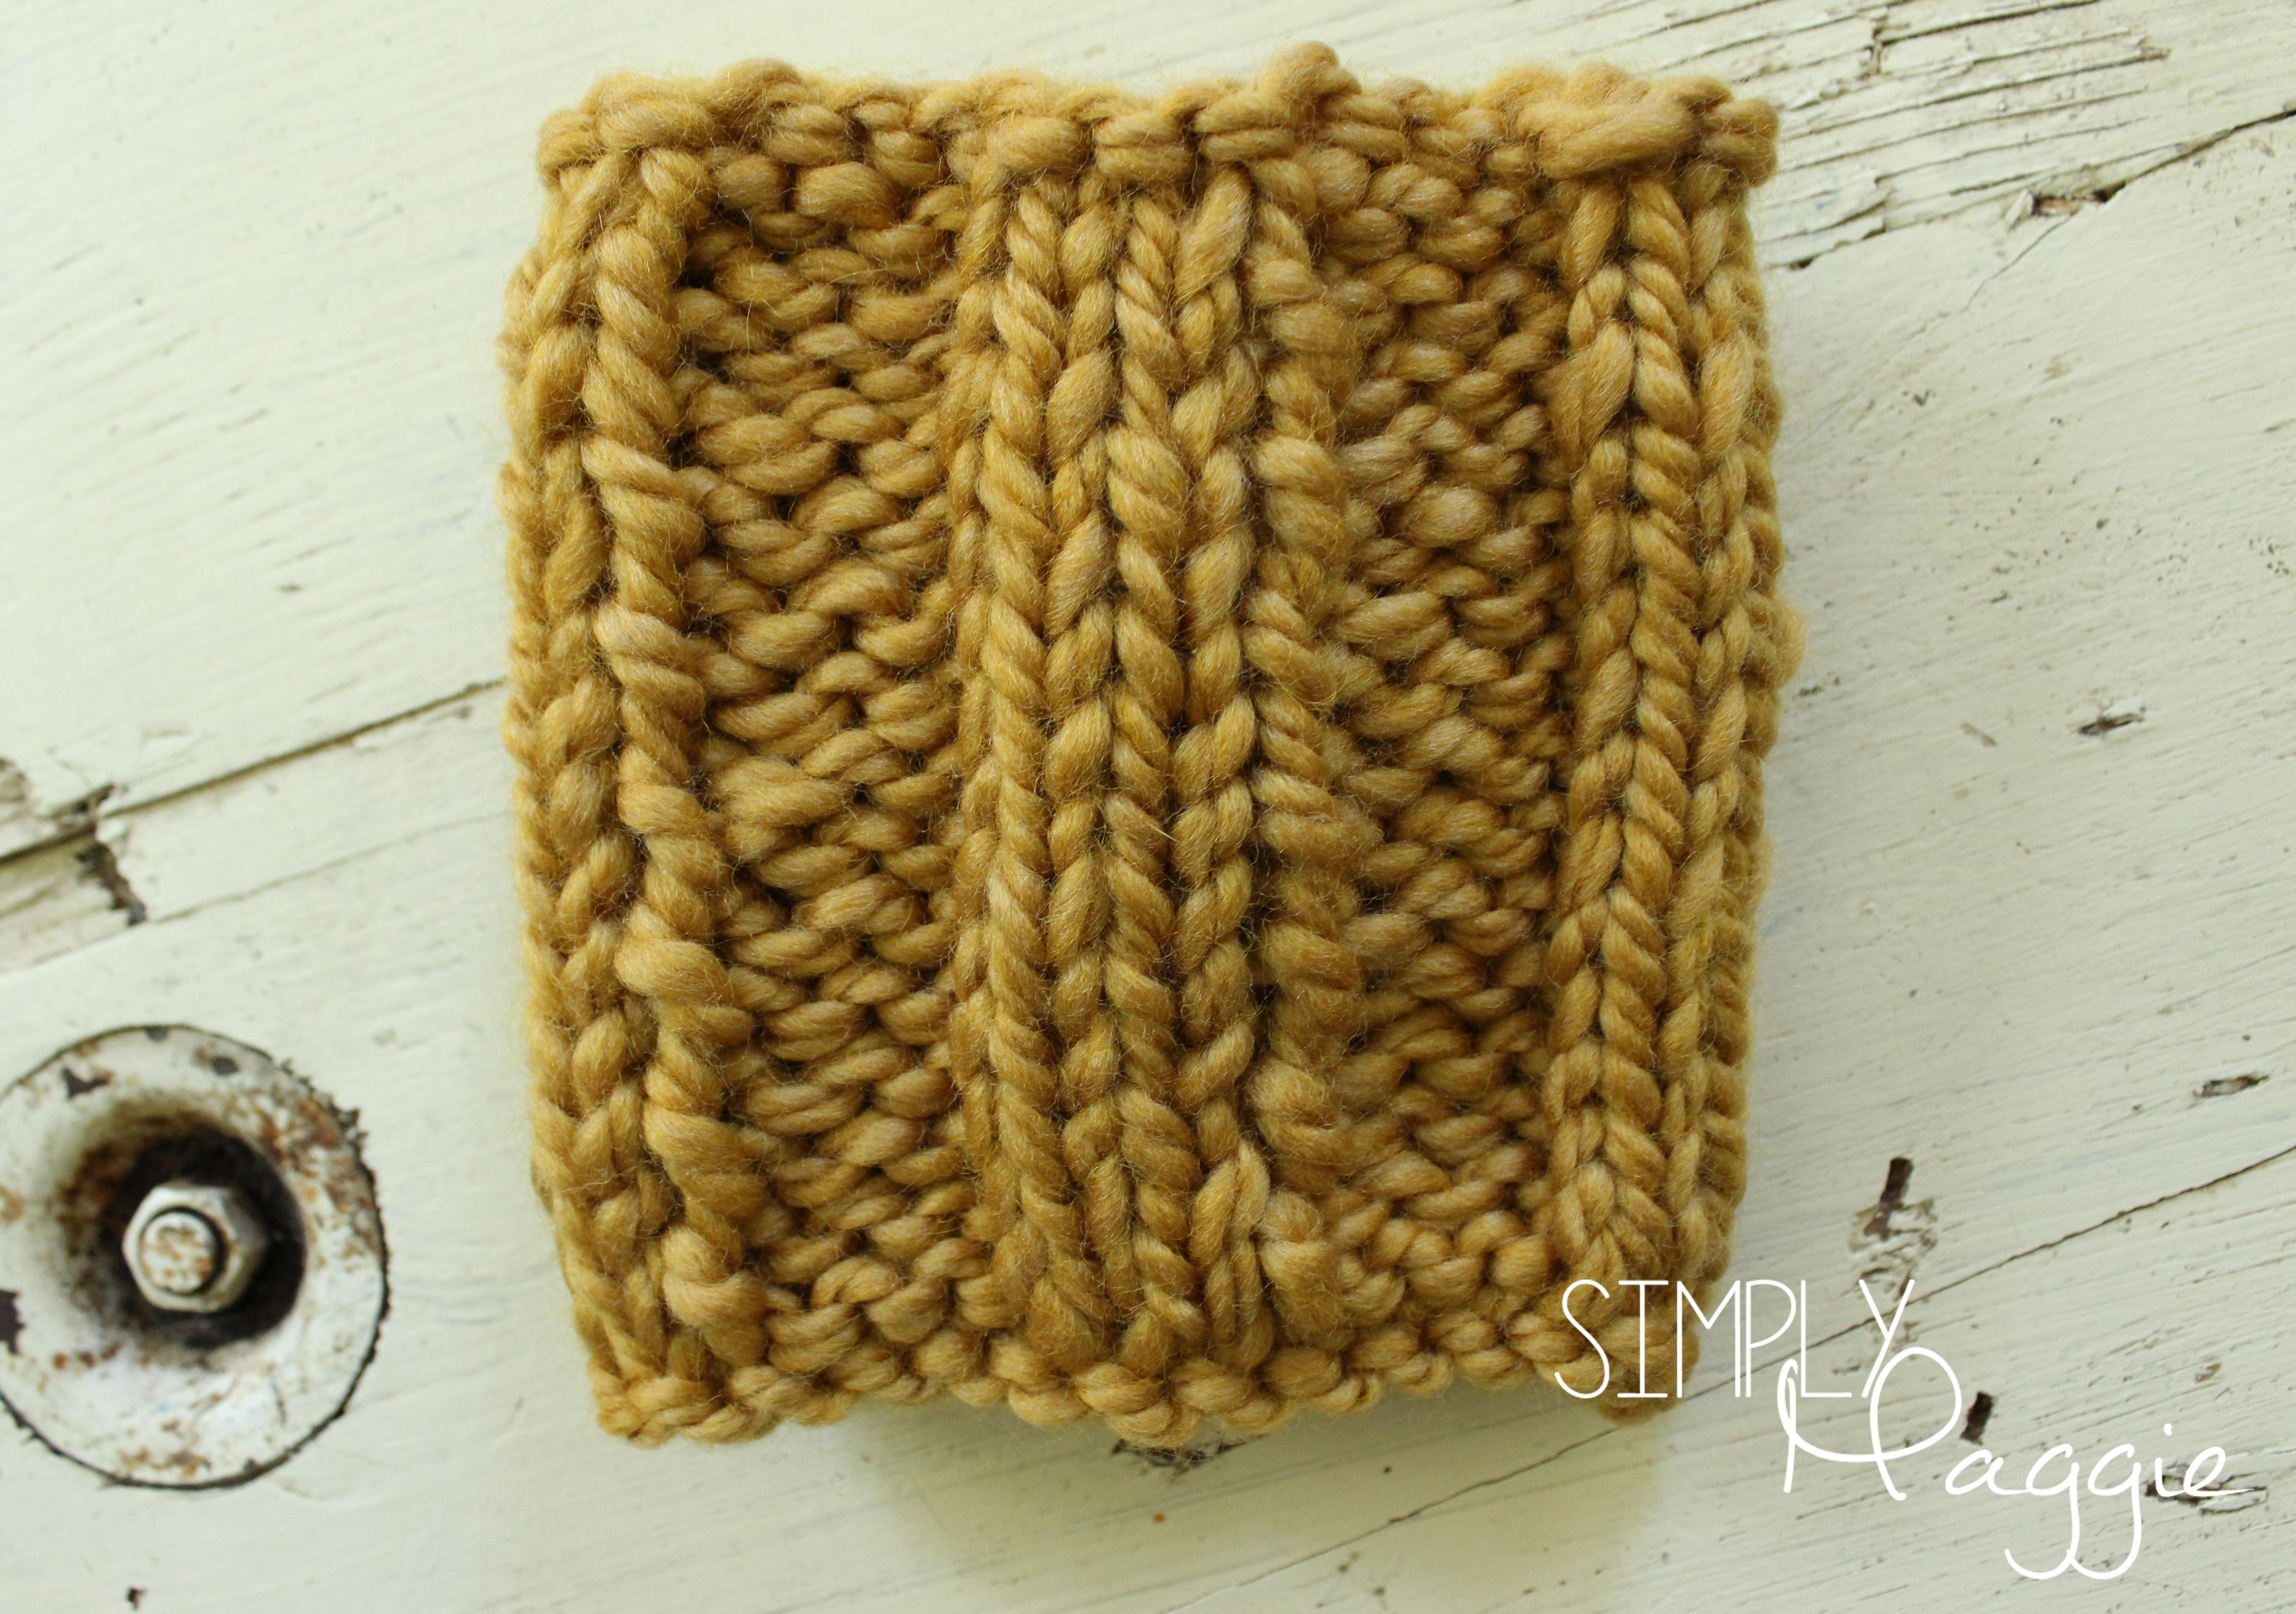 Shawl Patterns Knitting Free : Chunky, Rib Stitch Mug Cozy, Free Pattern - Simply Maggie SimplyMaggie.com